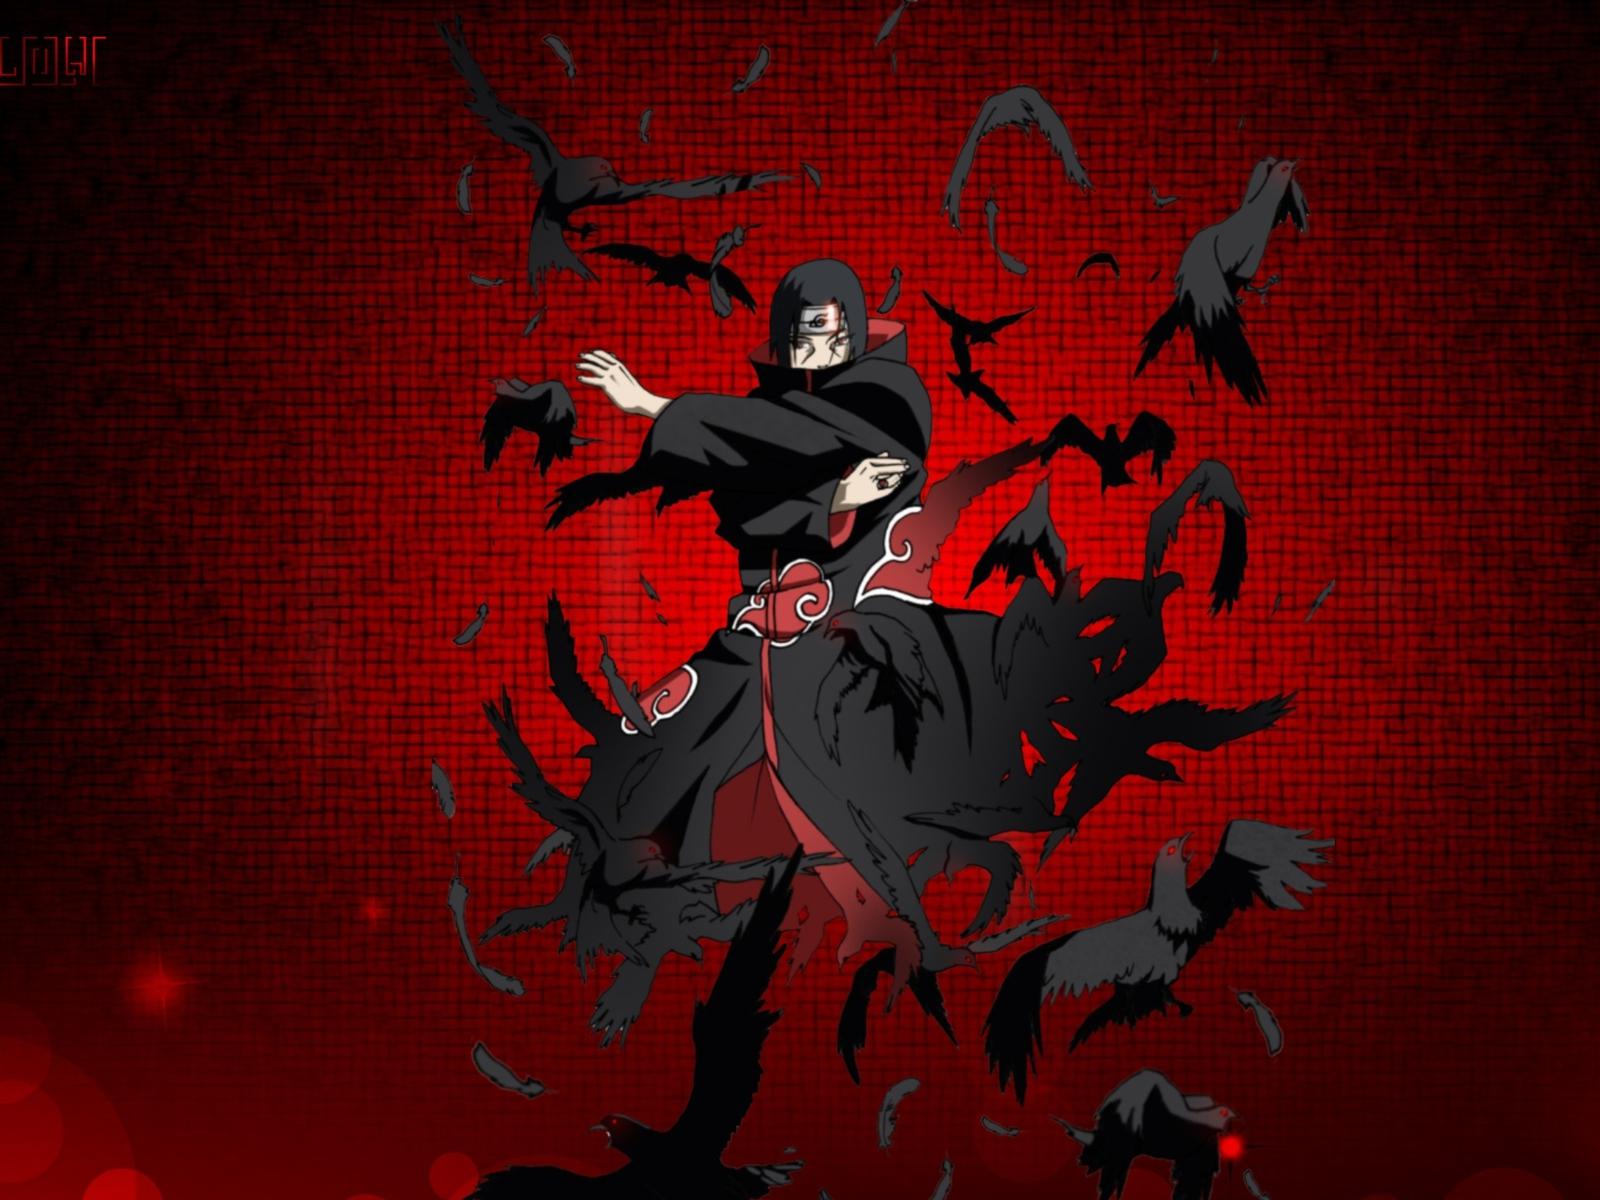 shippuden akatsuki uchiha itachi crows 1600x1200 wallpaper wallpaperItachi Crows Wallpaper